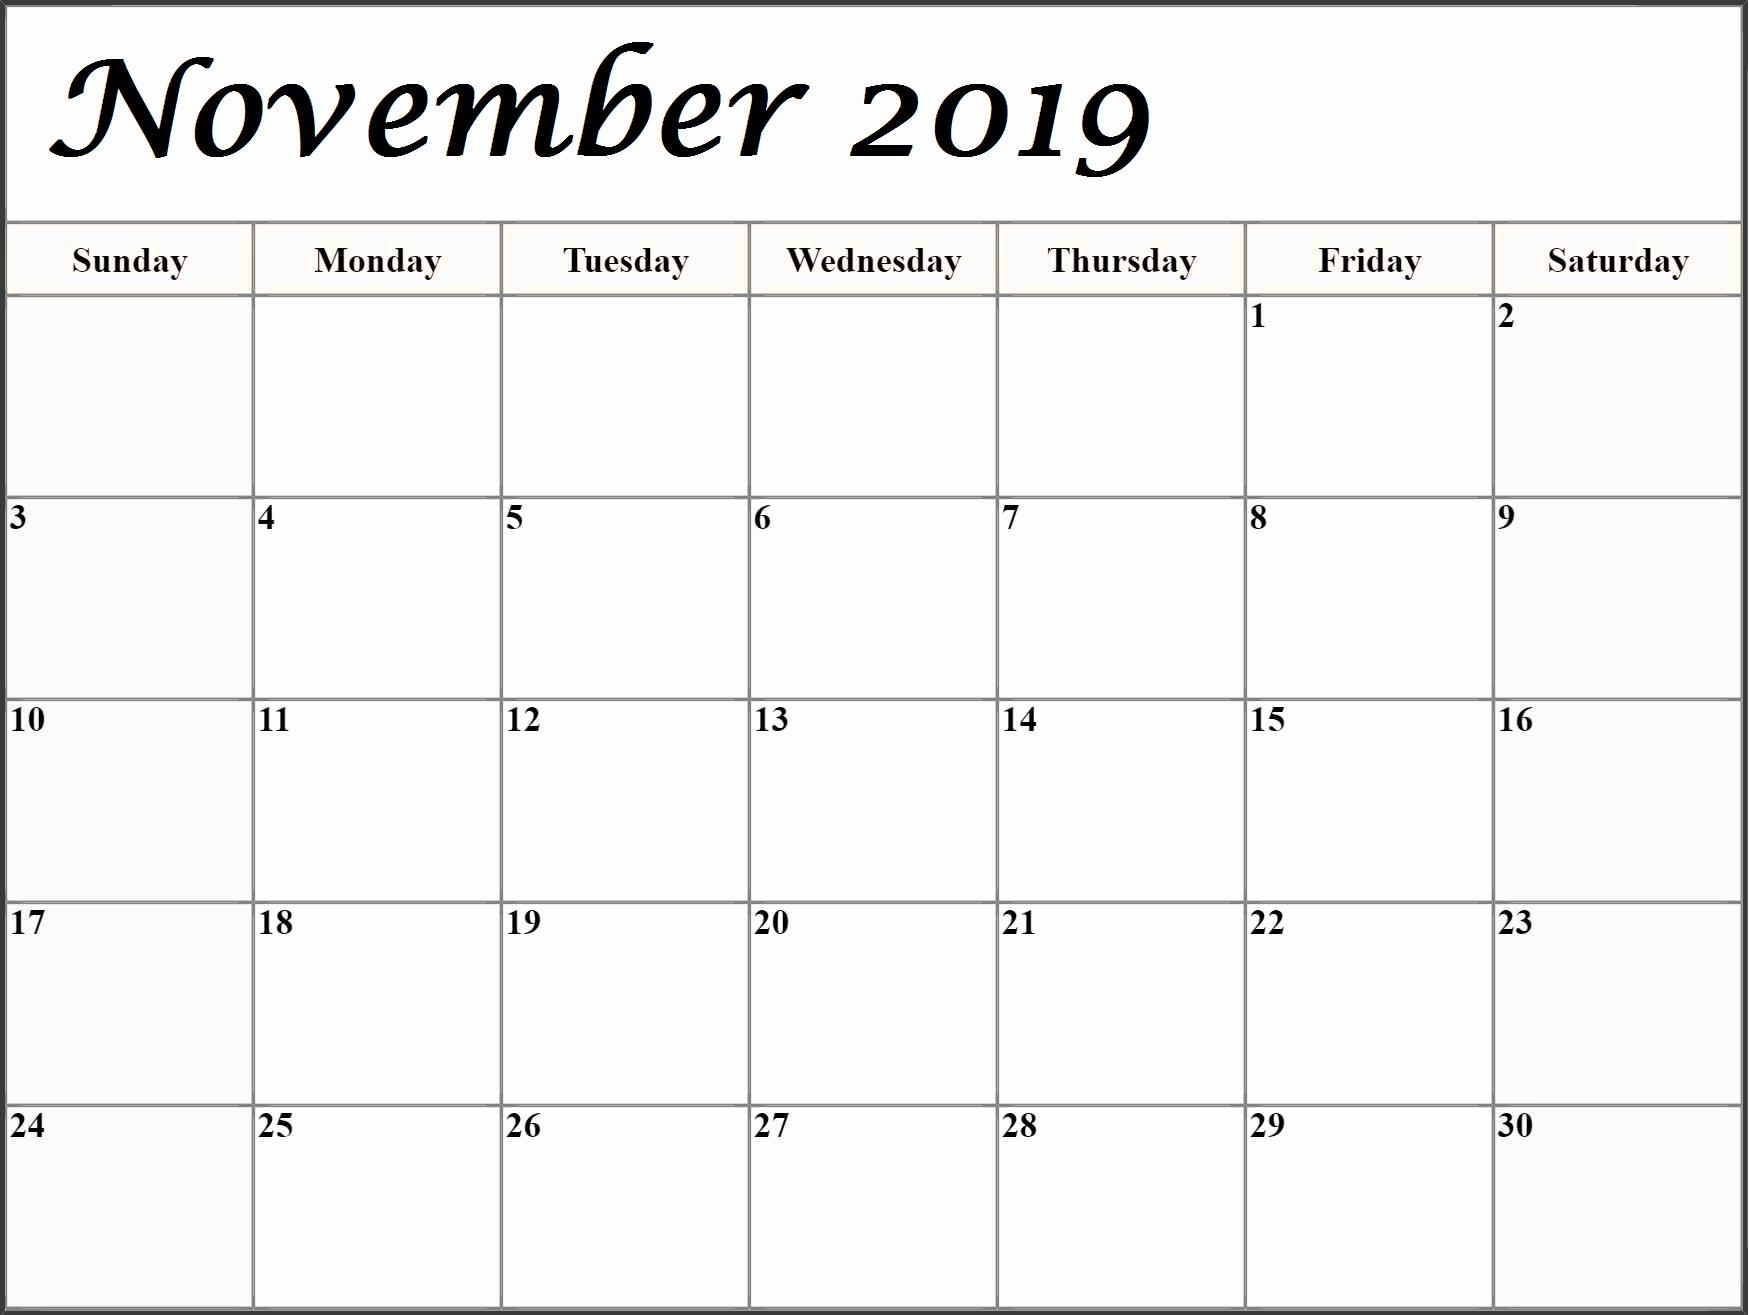 Free Printable Calendar November 2019 Template